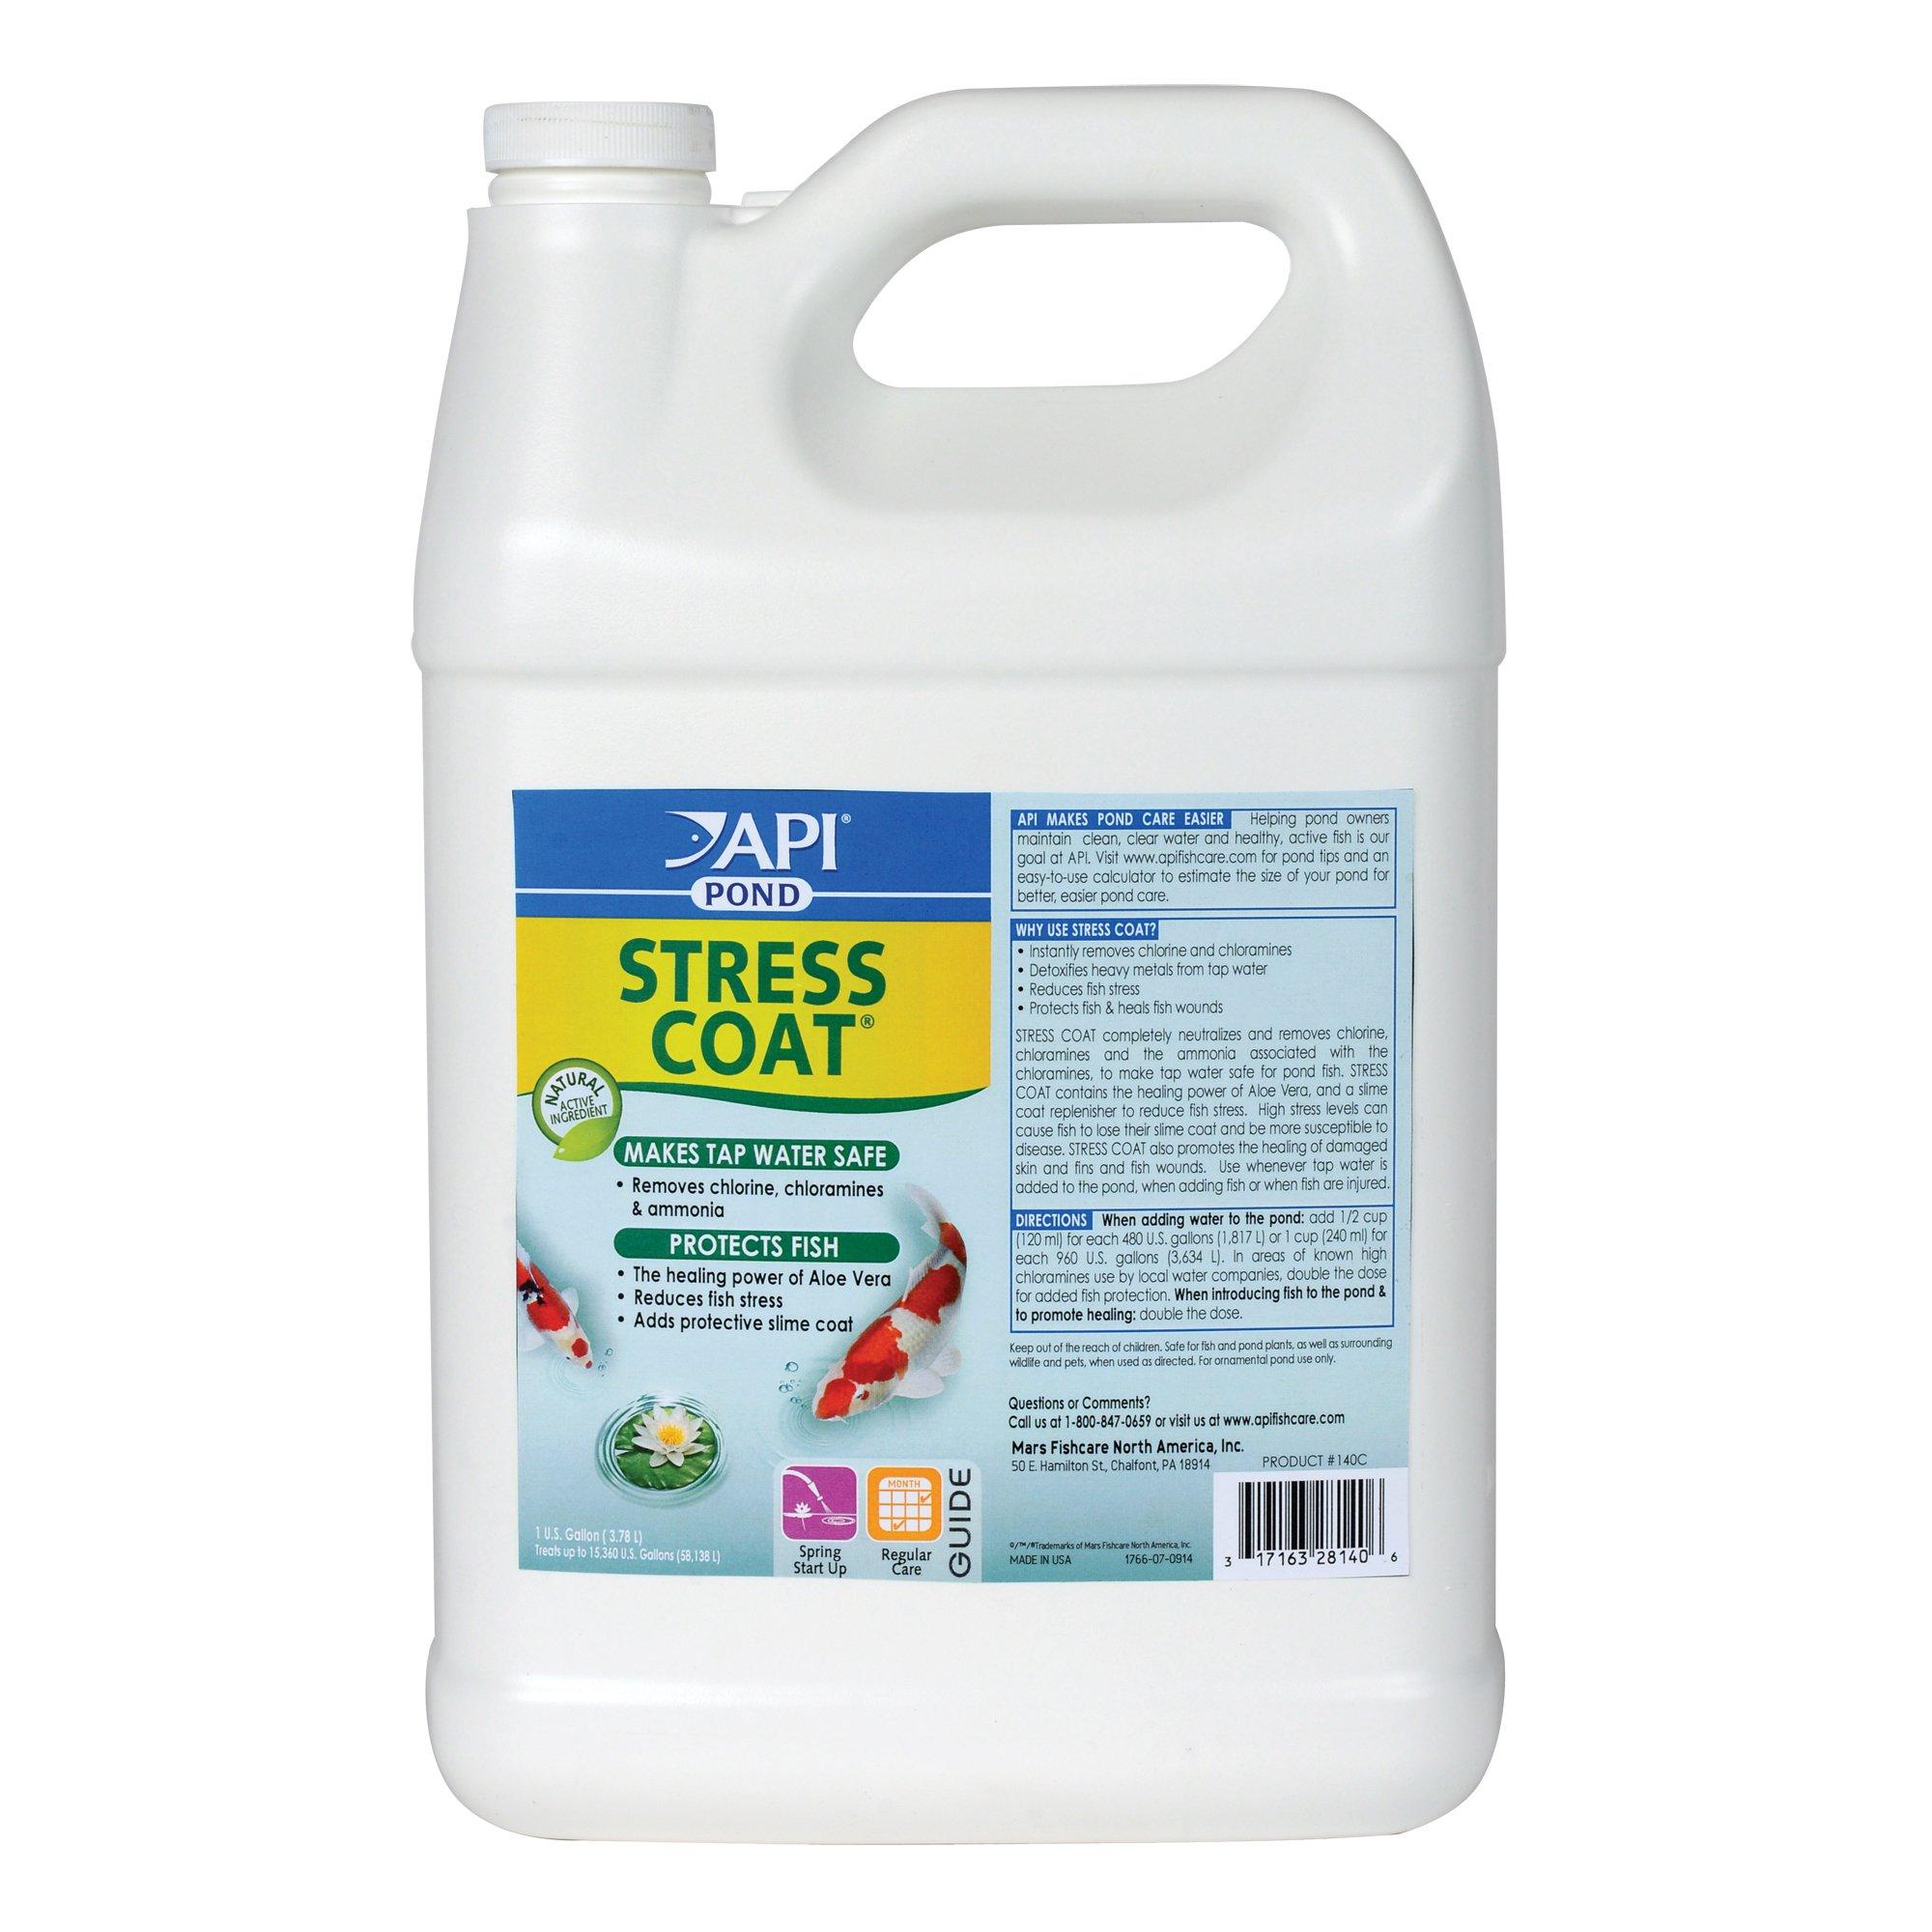 API TRIPLE SULFA Freshwater Fish Powder Medication 10-Count Box